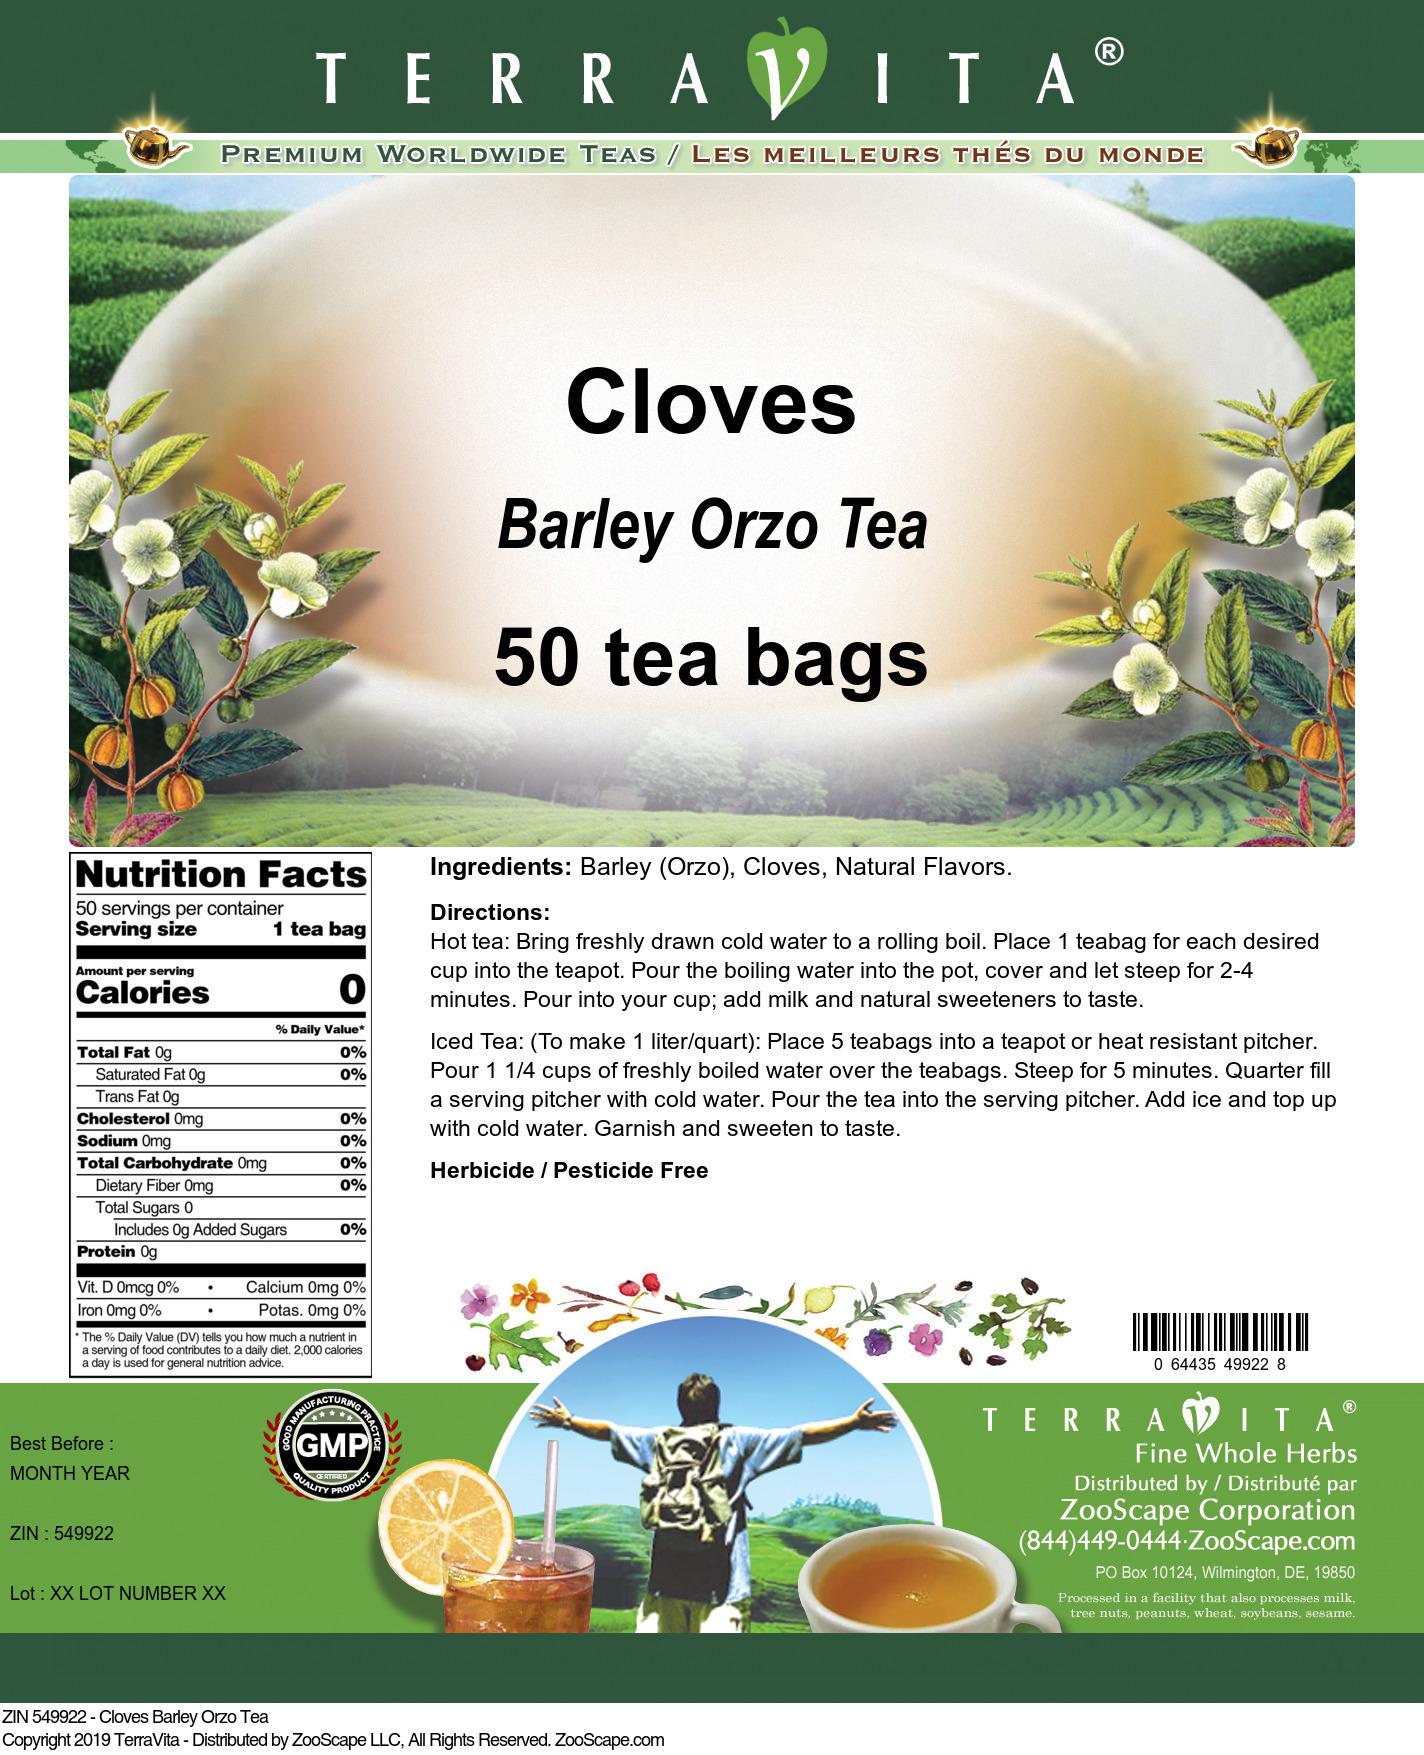 Cloves Barley Orzo Tea